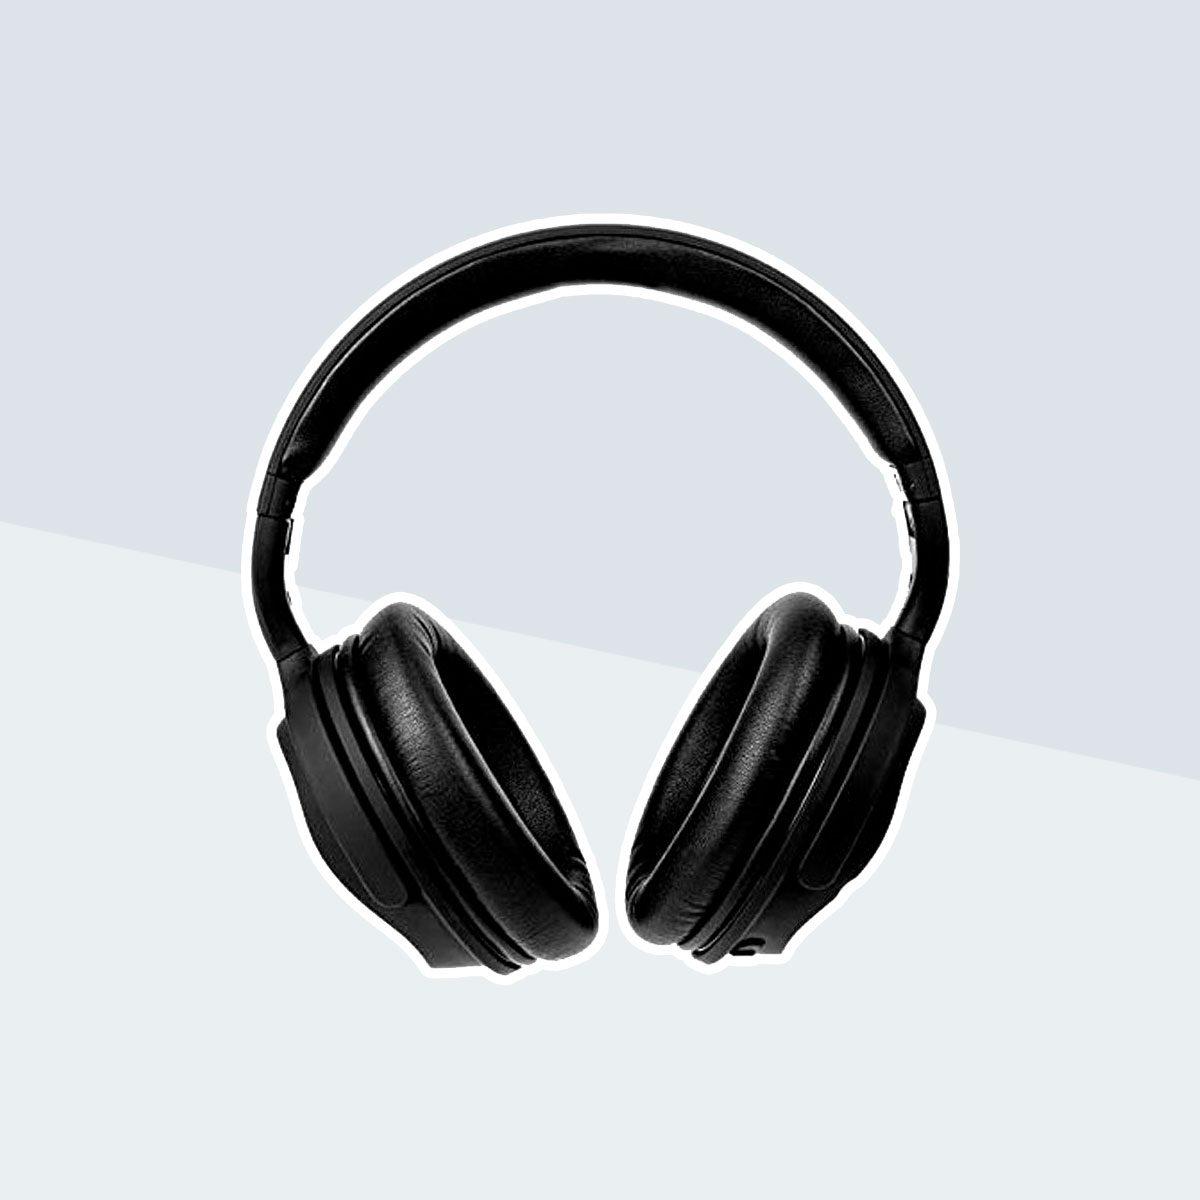 Wicked Audio HUM 1000 Wireless Bluetooth Headphones